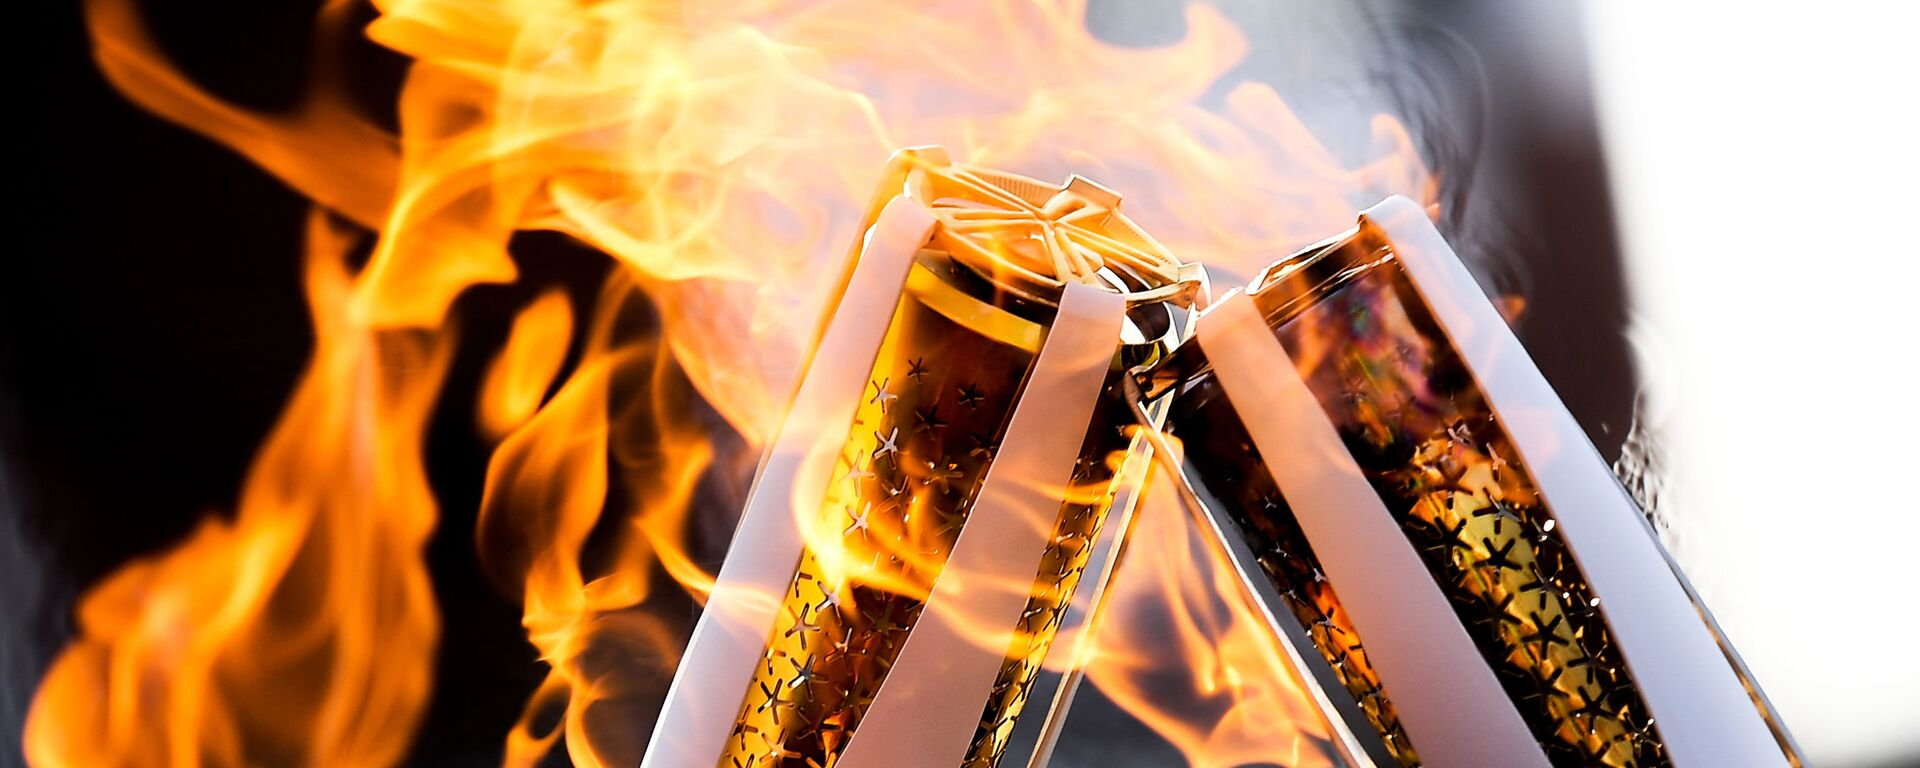 Факелы с Олимпийским огнём во время эстафеты Олимпийского огня - Sputnik Тоҷикистон, 1920, 21.07.2021